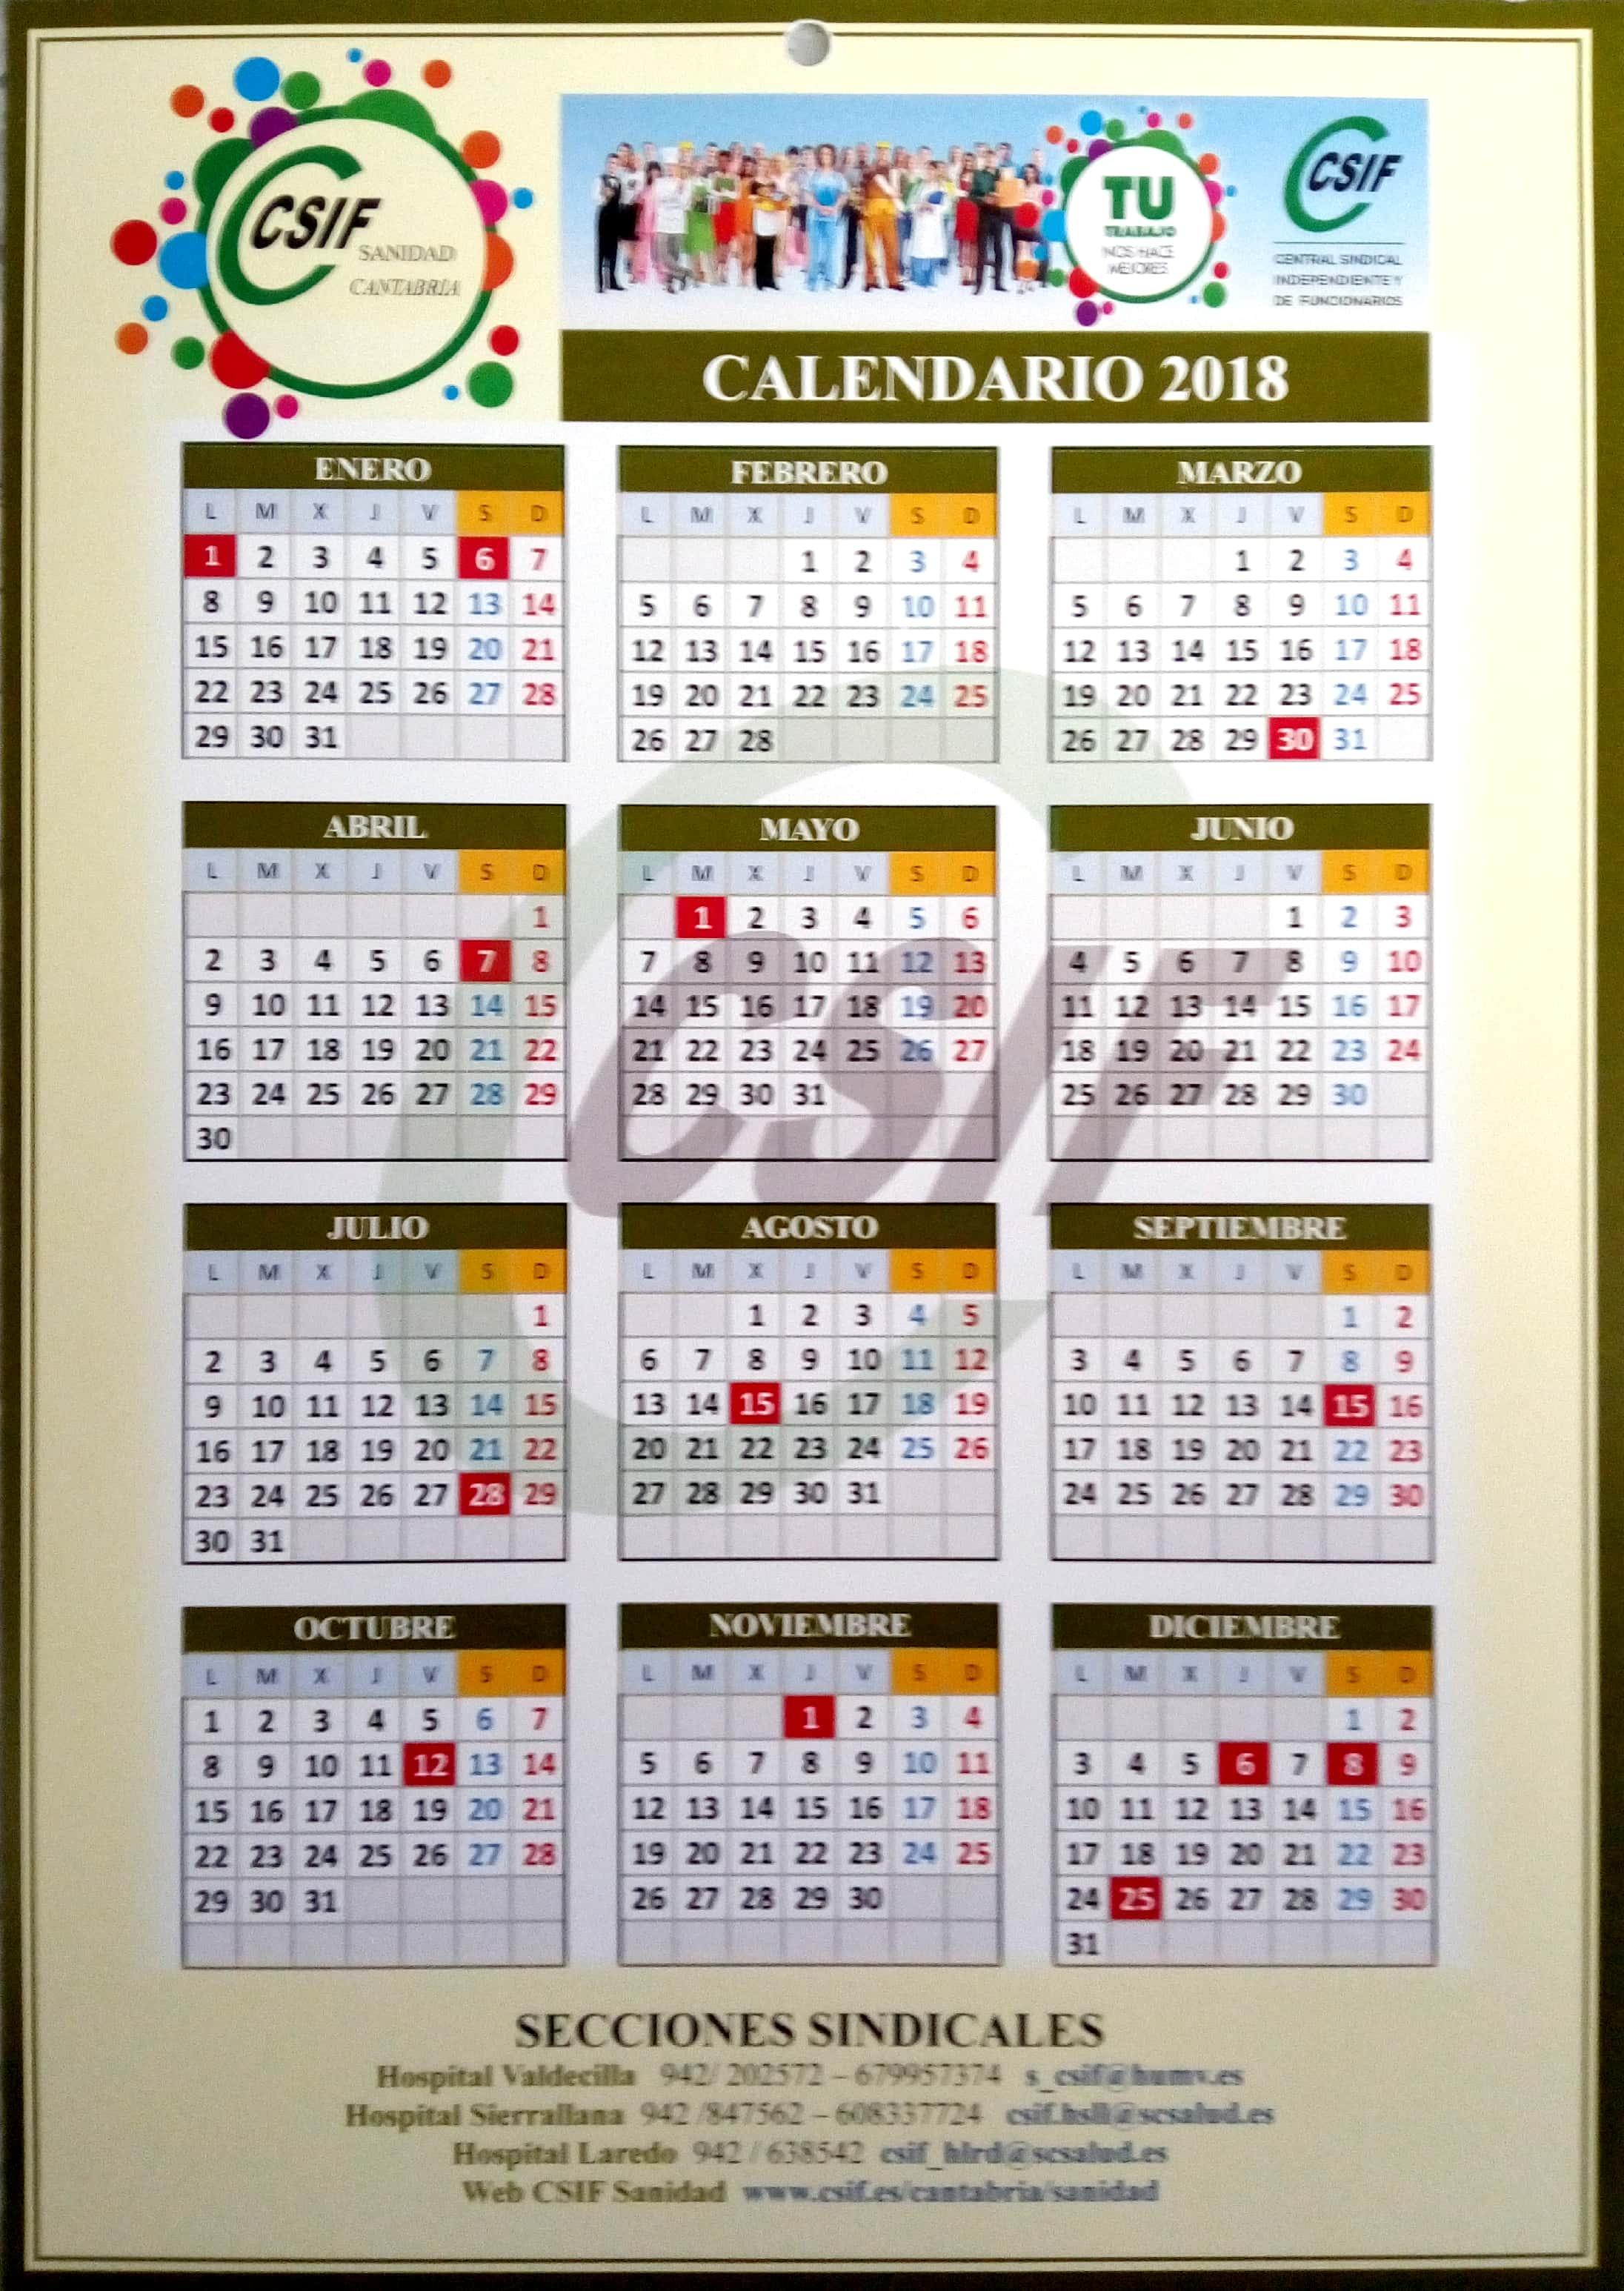 https://www.csif.es/sites/default/files/field/image/Calendario%202018.jpg